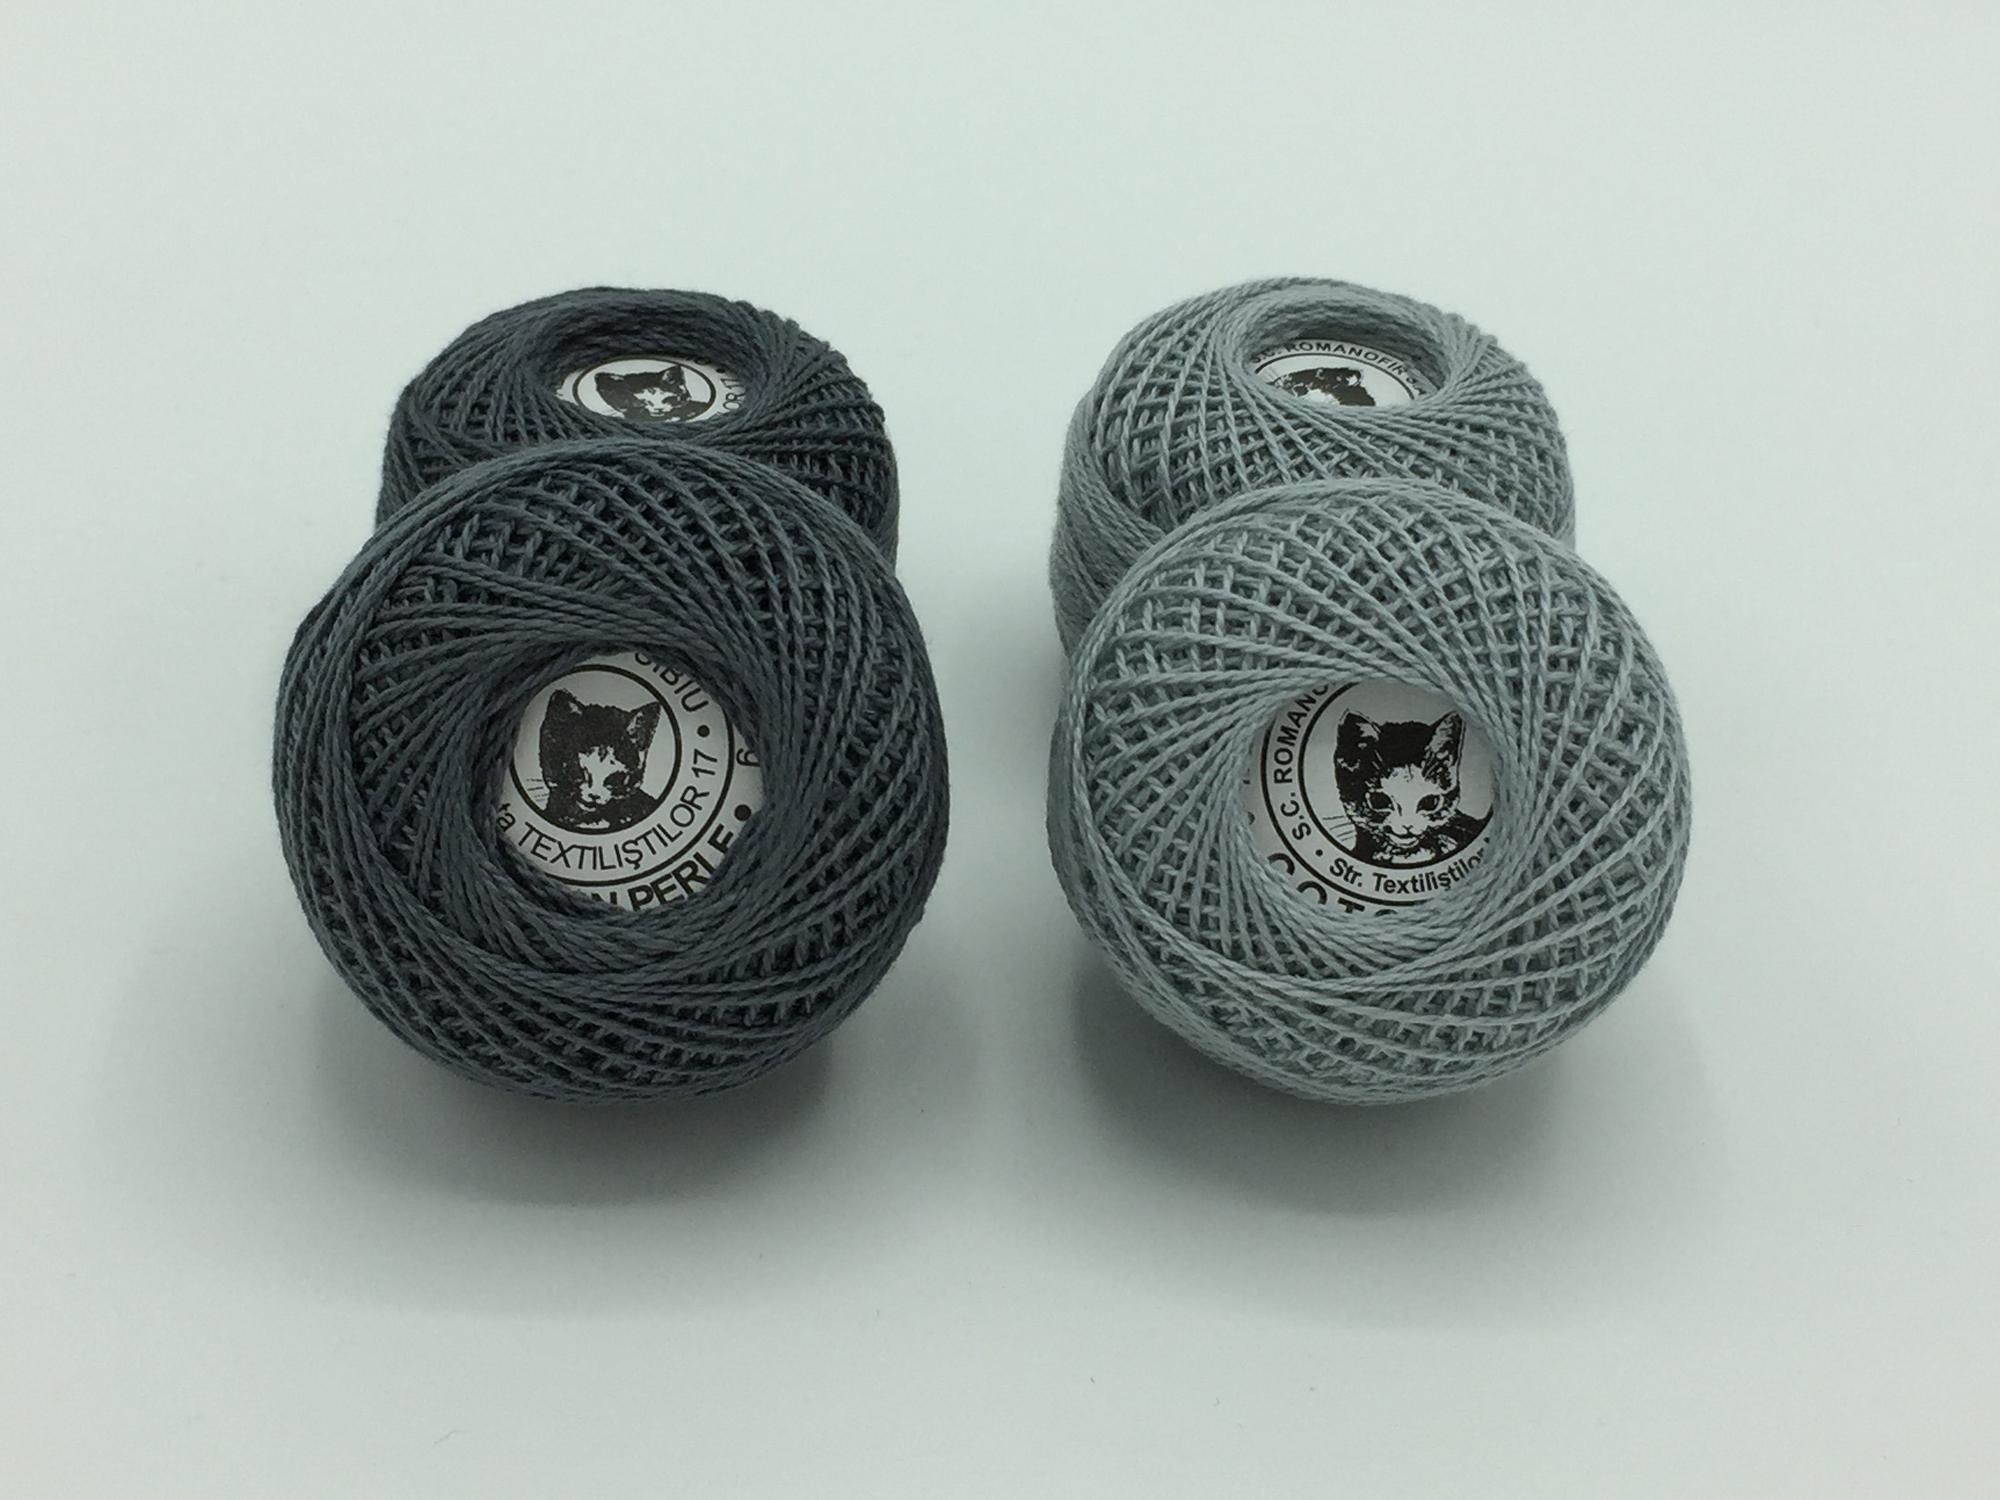 Ata cotton-perle 100% bumbac - Gri - 10 gheme - Romanofir 20/2